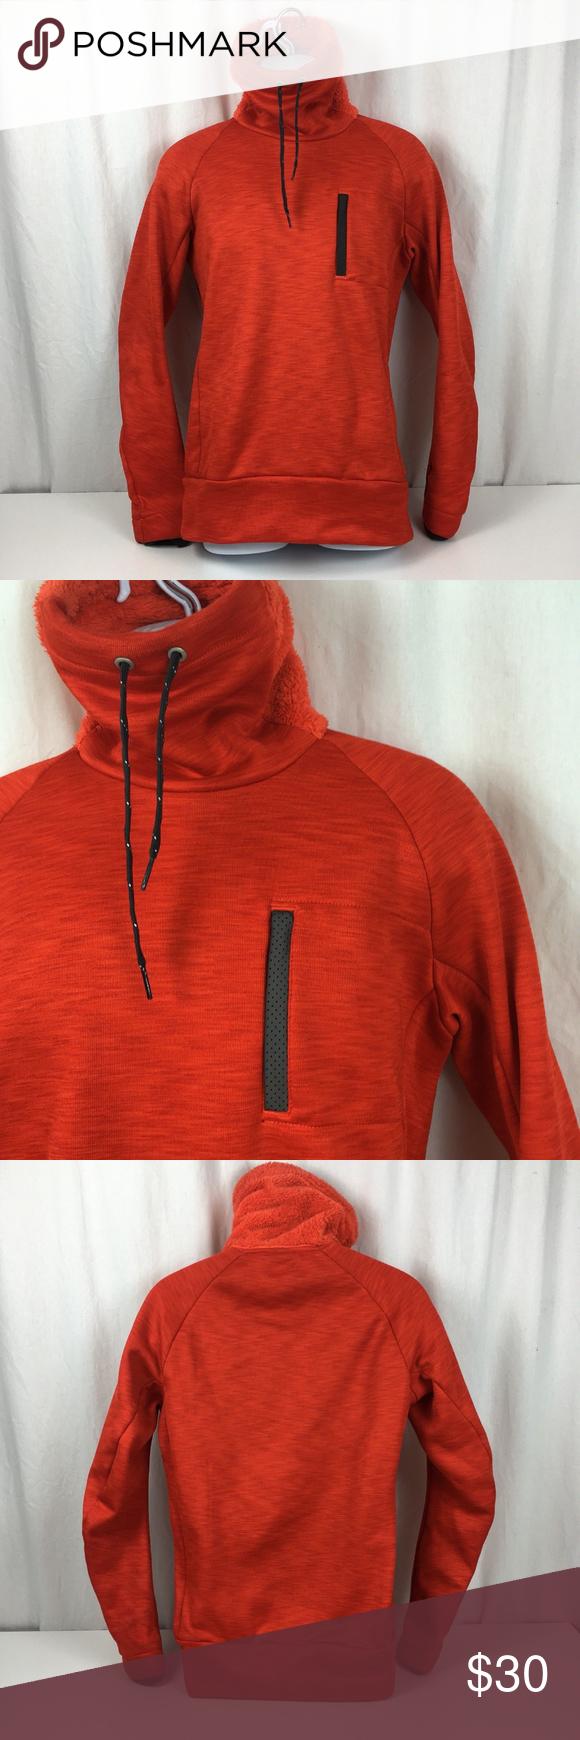 Predownload: Adidas Climaheat Training Sweatshirt Adidas Climaheat Men S Sweatshirt Orange Space Dye High Neck Not Hooded Drawstring F Clothes Design Sweatshirts Fashion [ 1740 x 580 Pixel ]